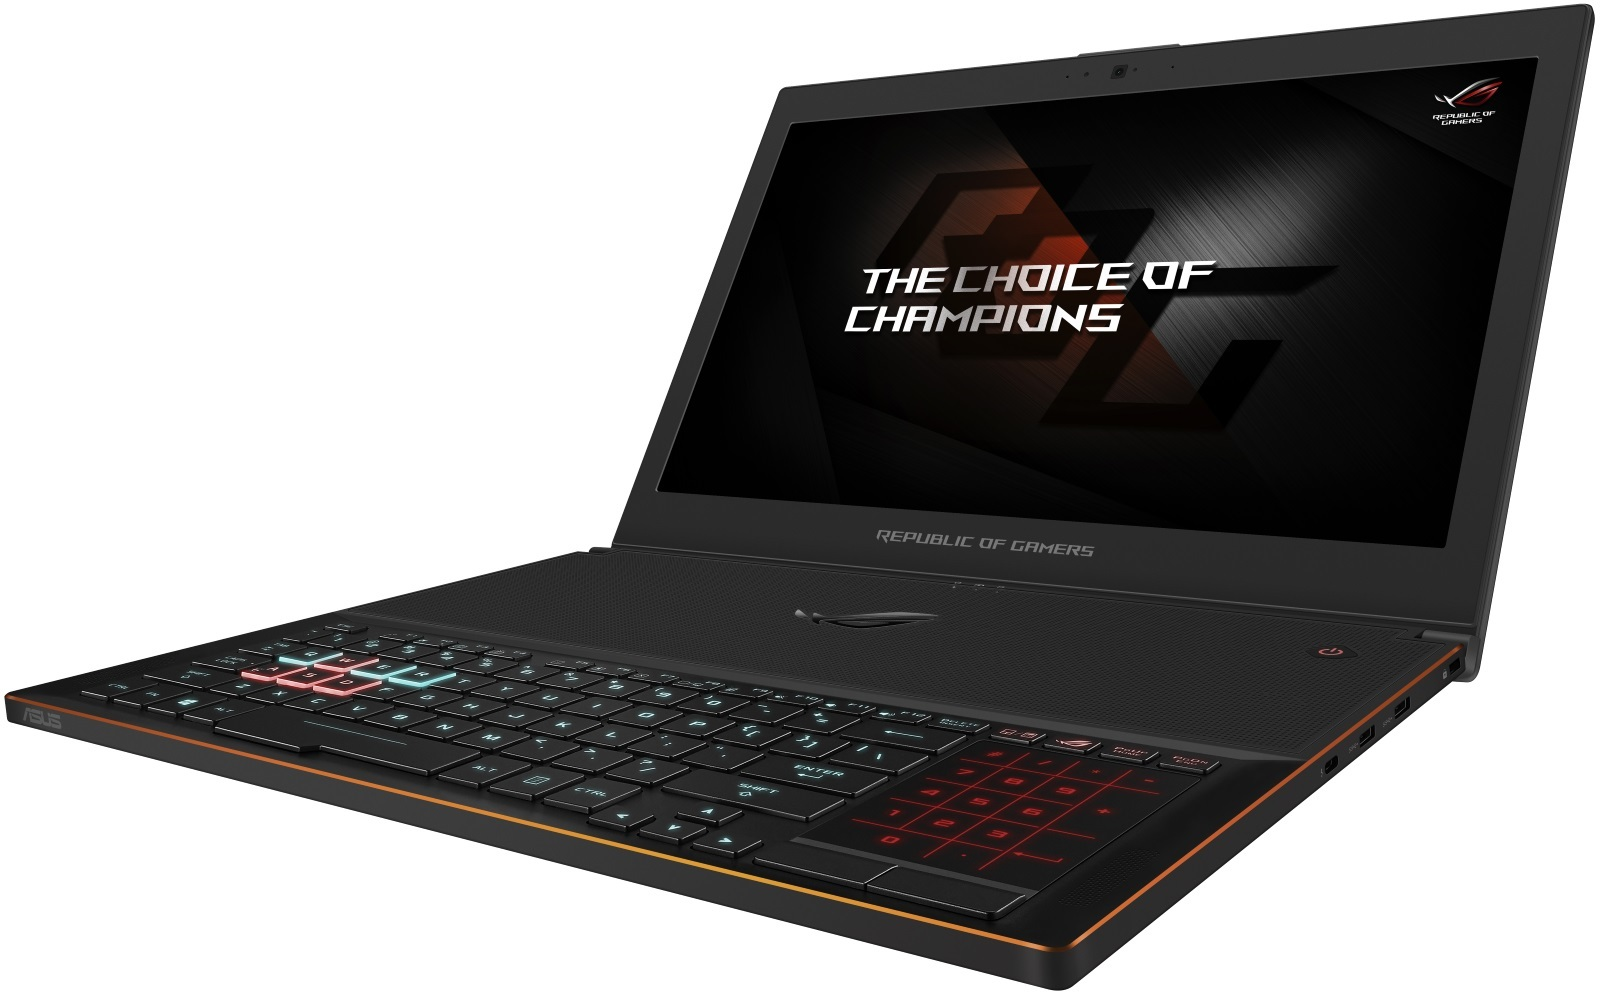 "ASUS Zephyrus 15.6"" Gaming Laptop | Intel Core i7 | NVIDIA GTX 1070 8GB | 16GB RAM + 512GB SSD | image"